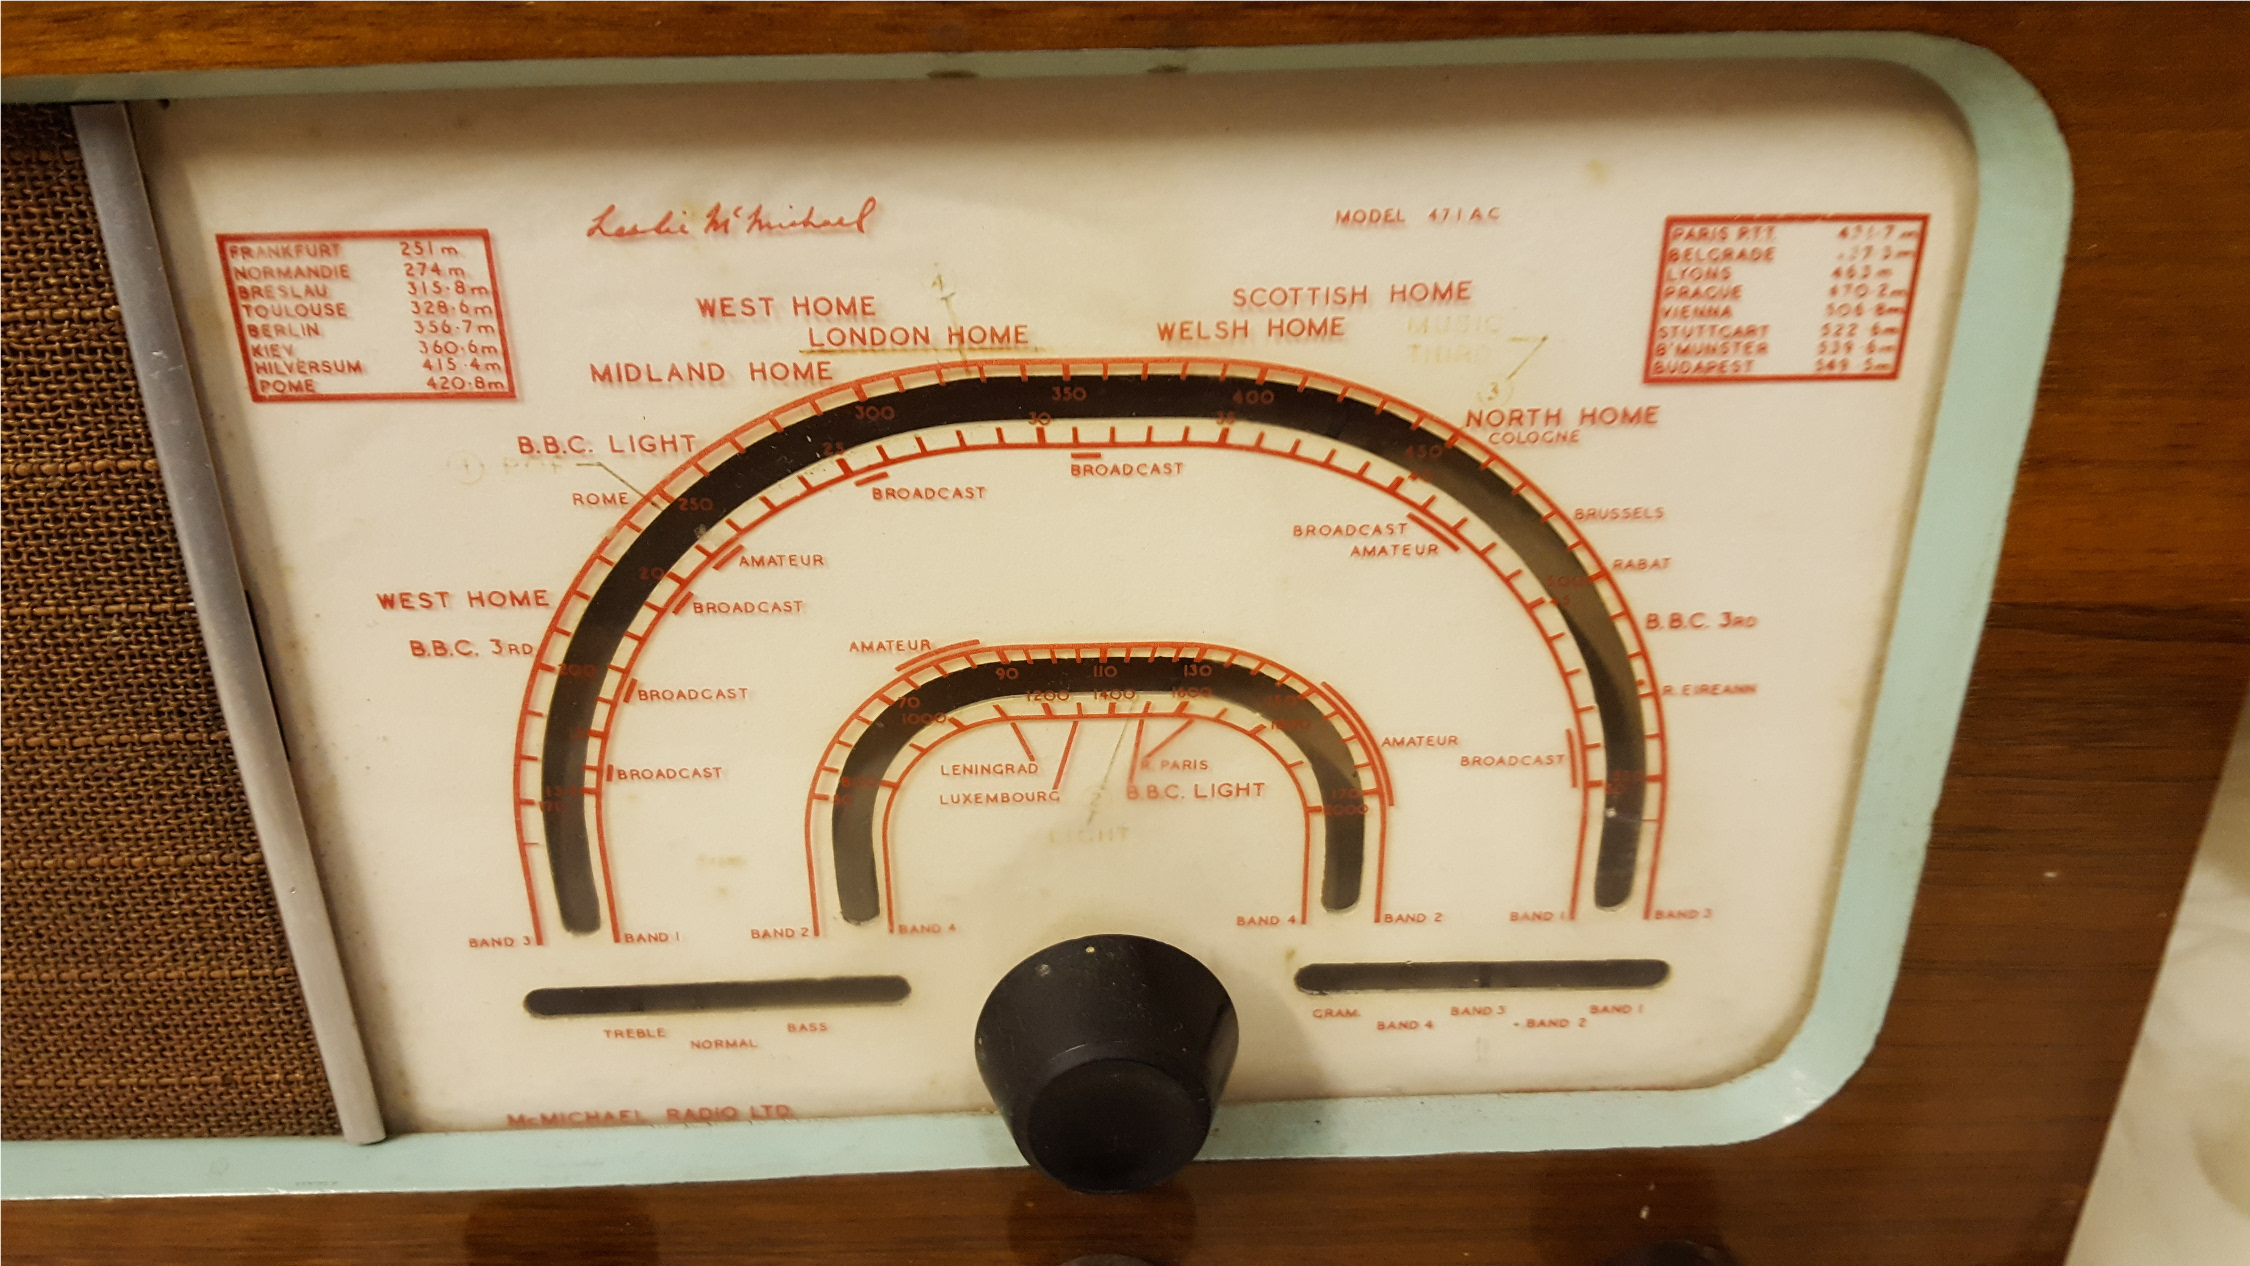 Lot 49 - Antique Vintage Retro McMichael Wireless Radio Similar to Model 471U